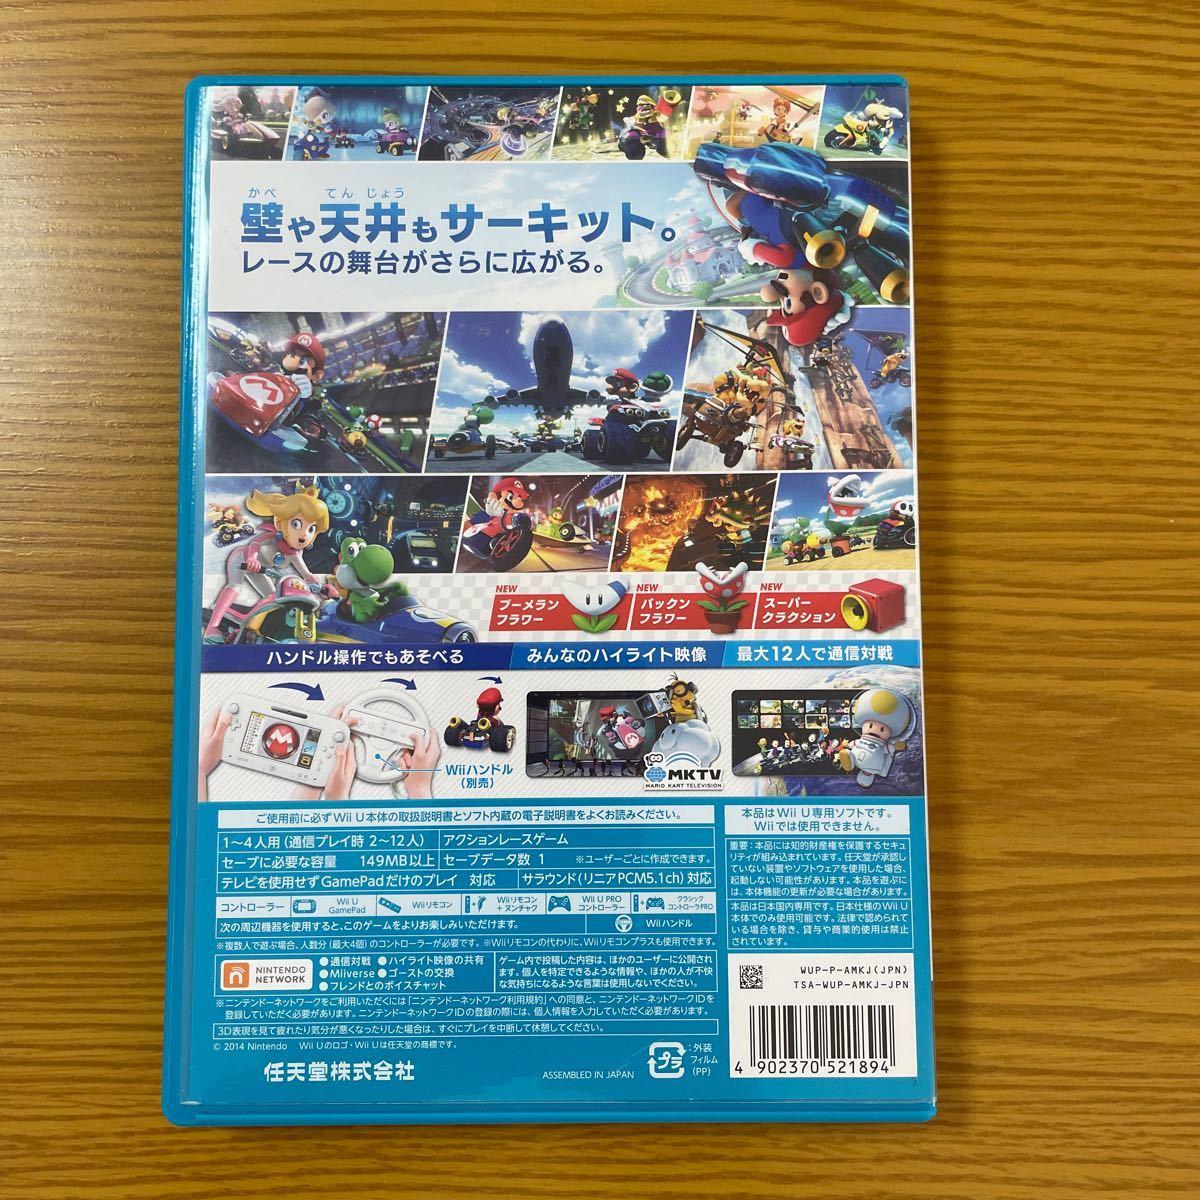 wiiU ソフト スプラトゥーン マリオカート8 任天堂